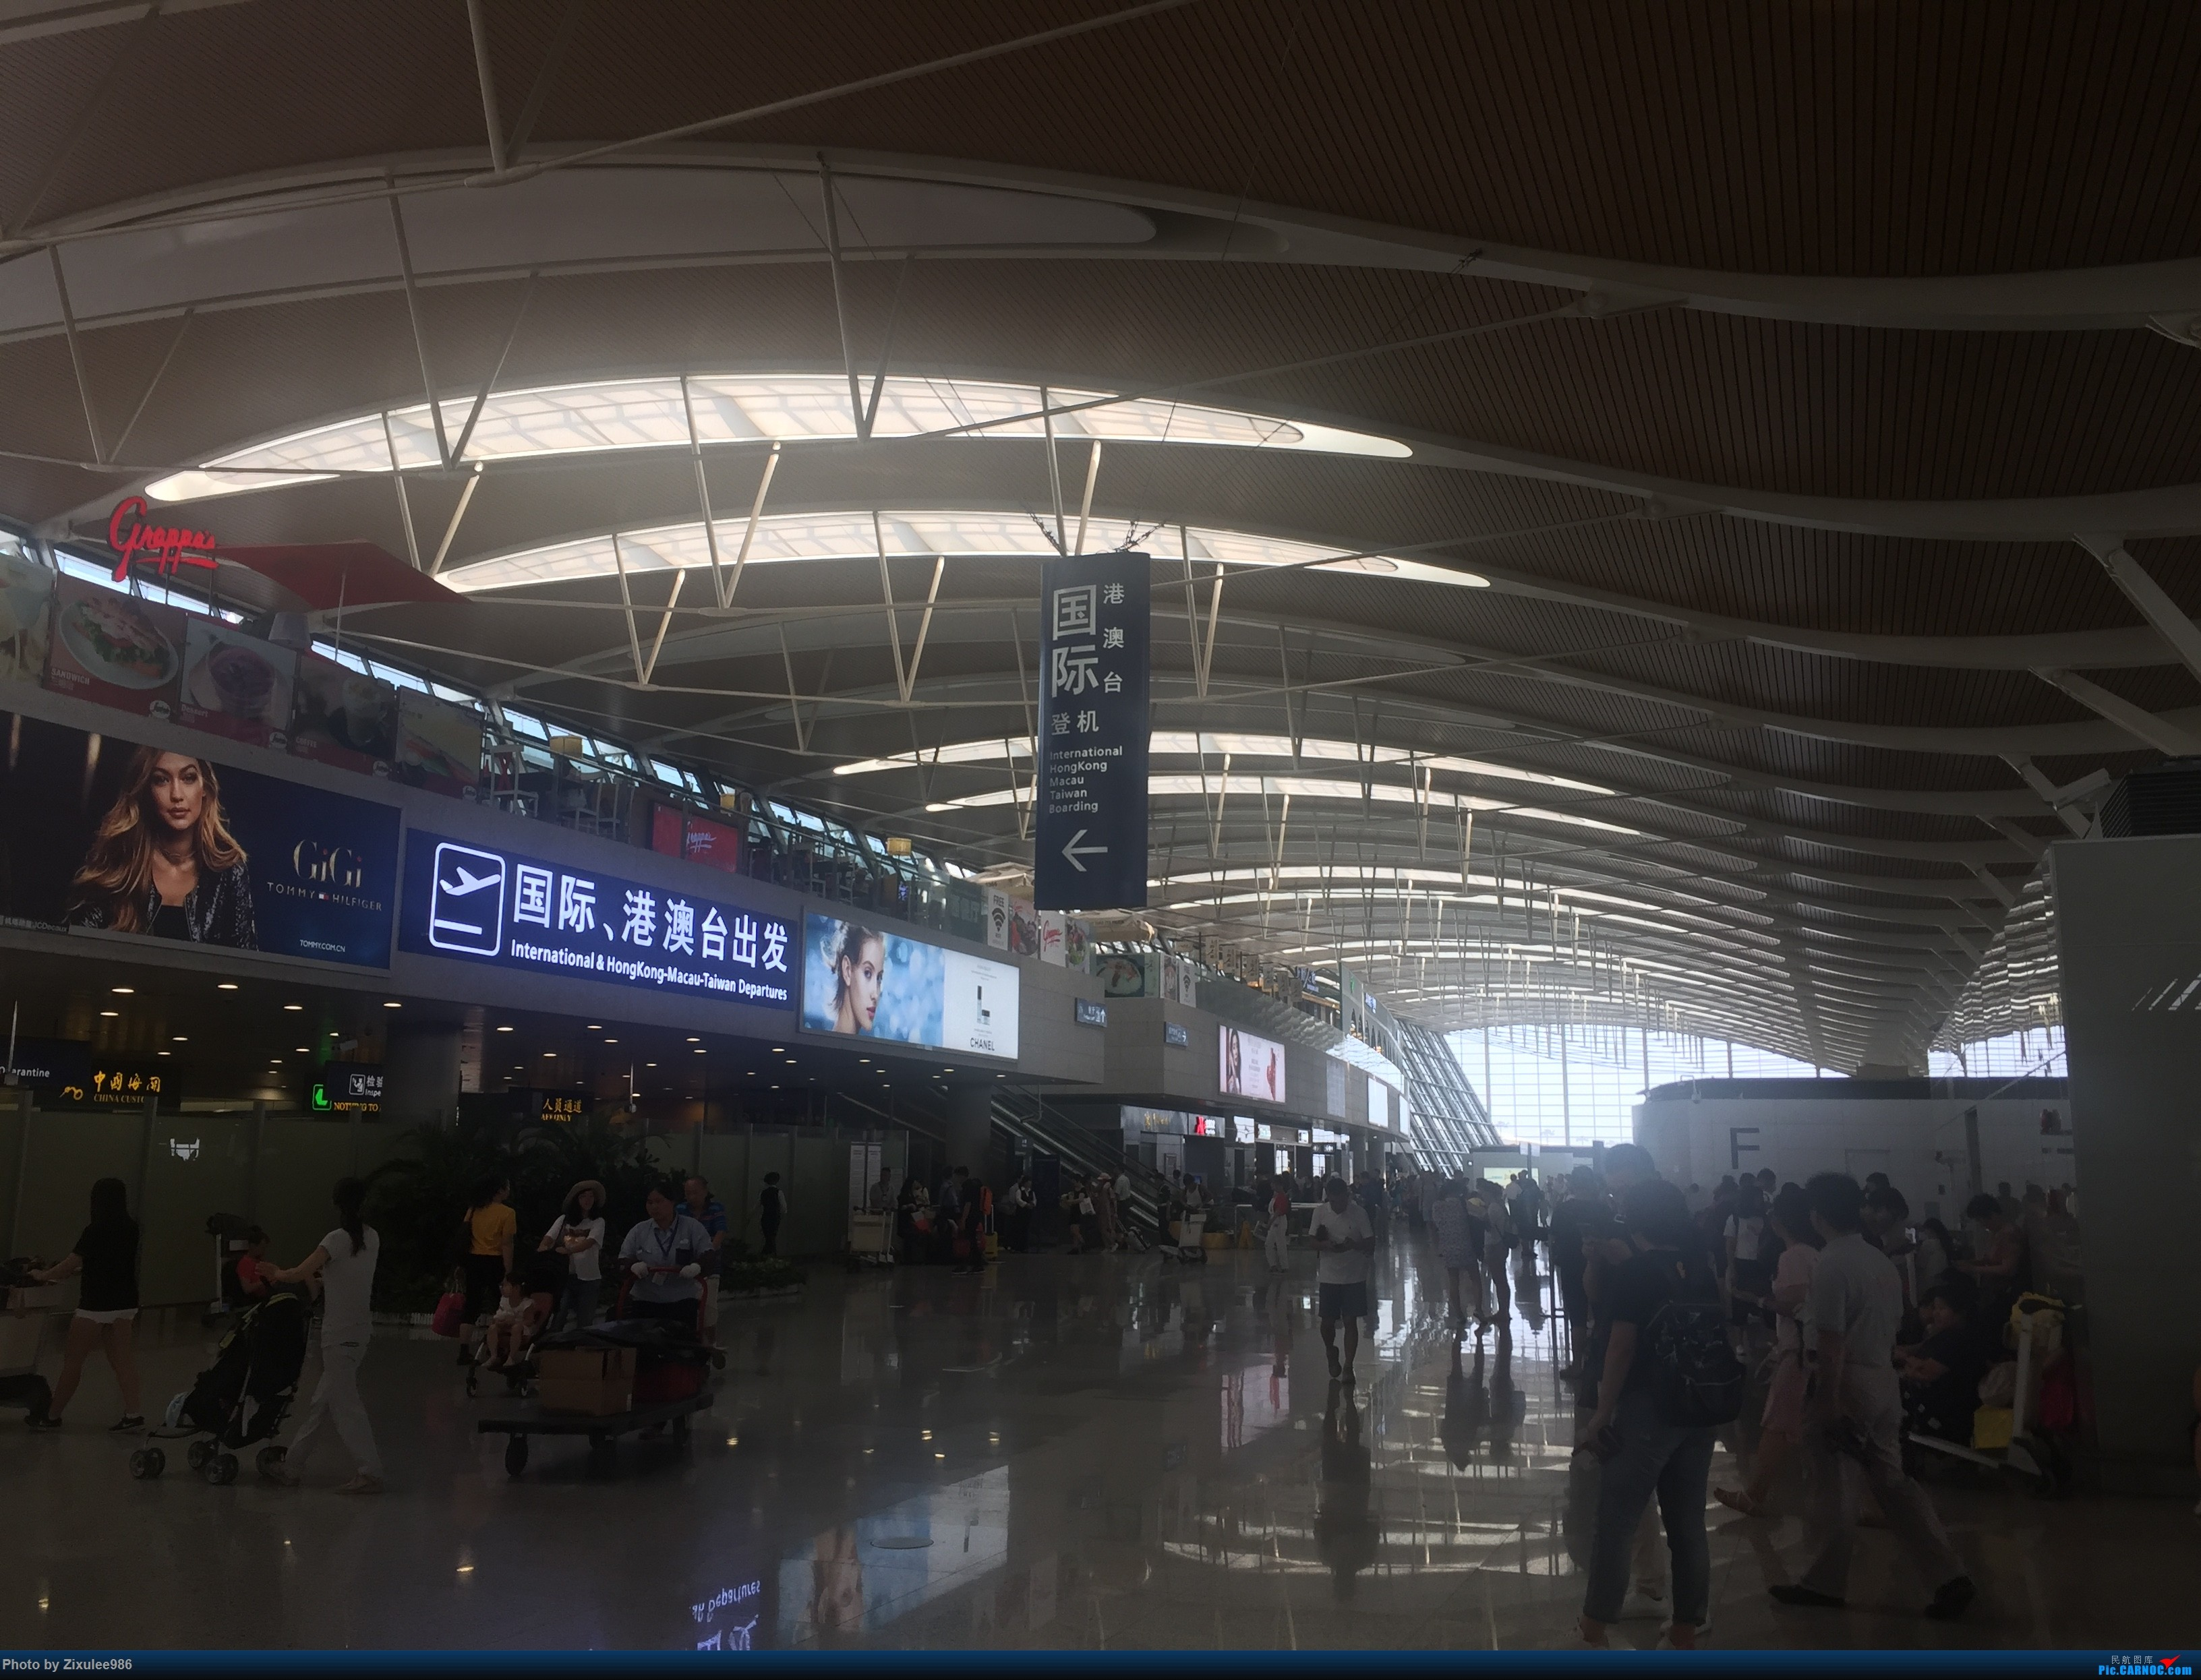 Re:[原创]加拿大21日游学之旅(一)~JJN-PVG-YYZ..(内含flightlog)~第一次发游记~多图缓更请谅解    中国上海浦东国际机场